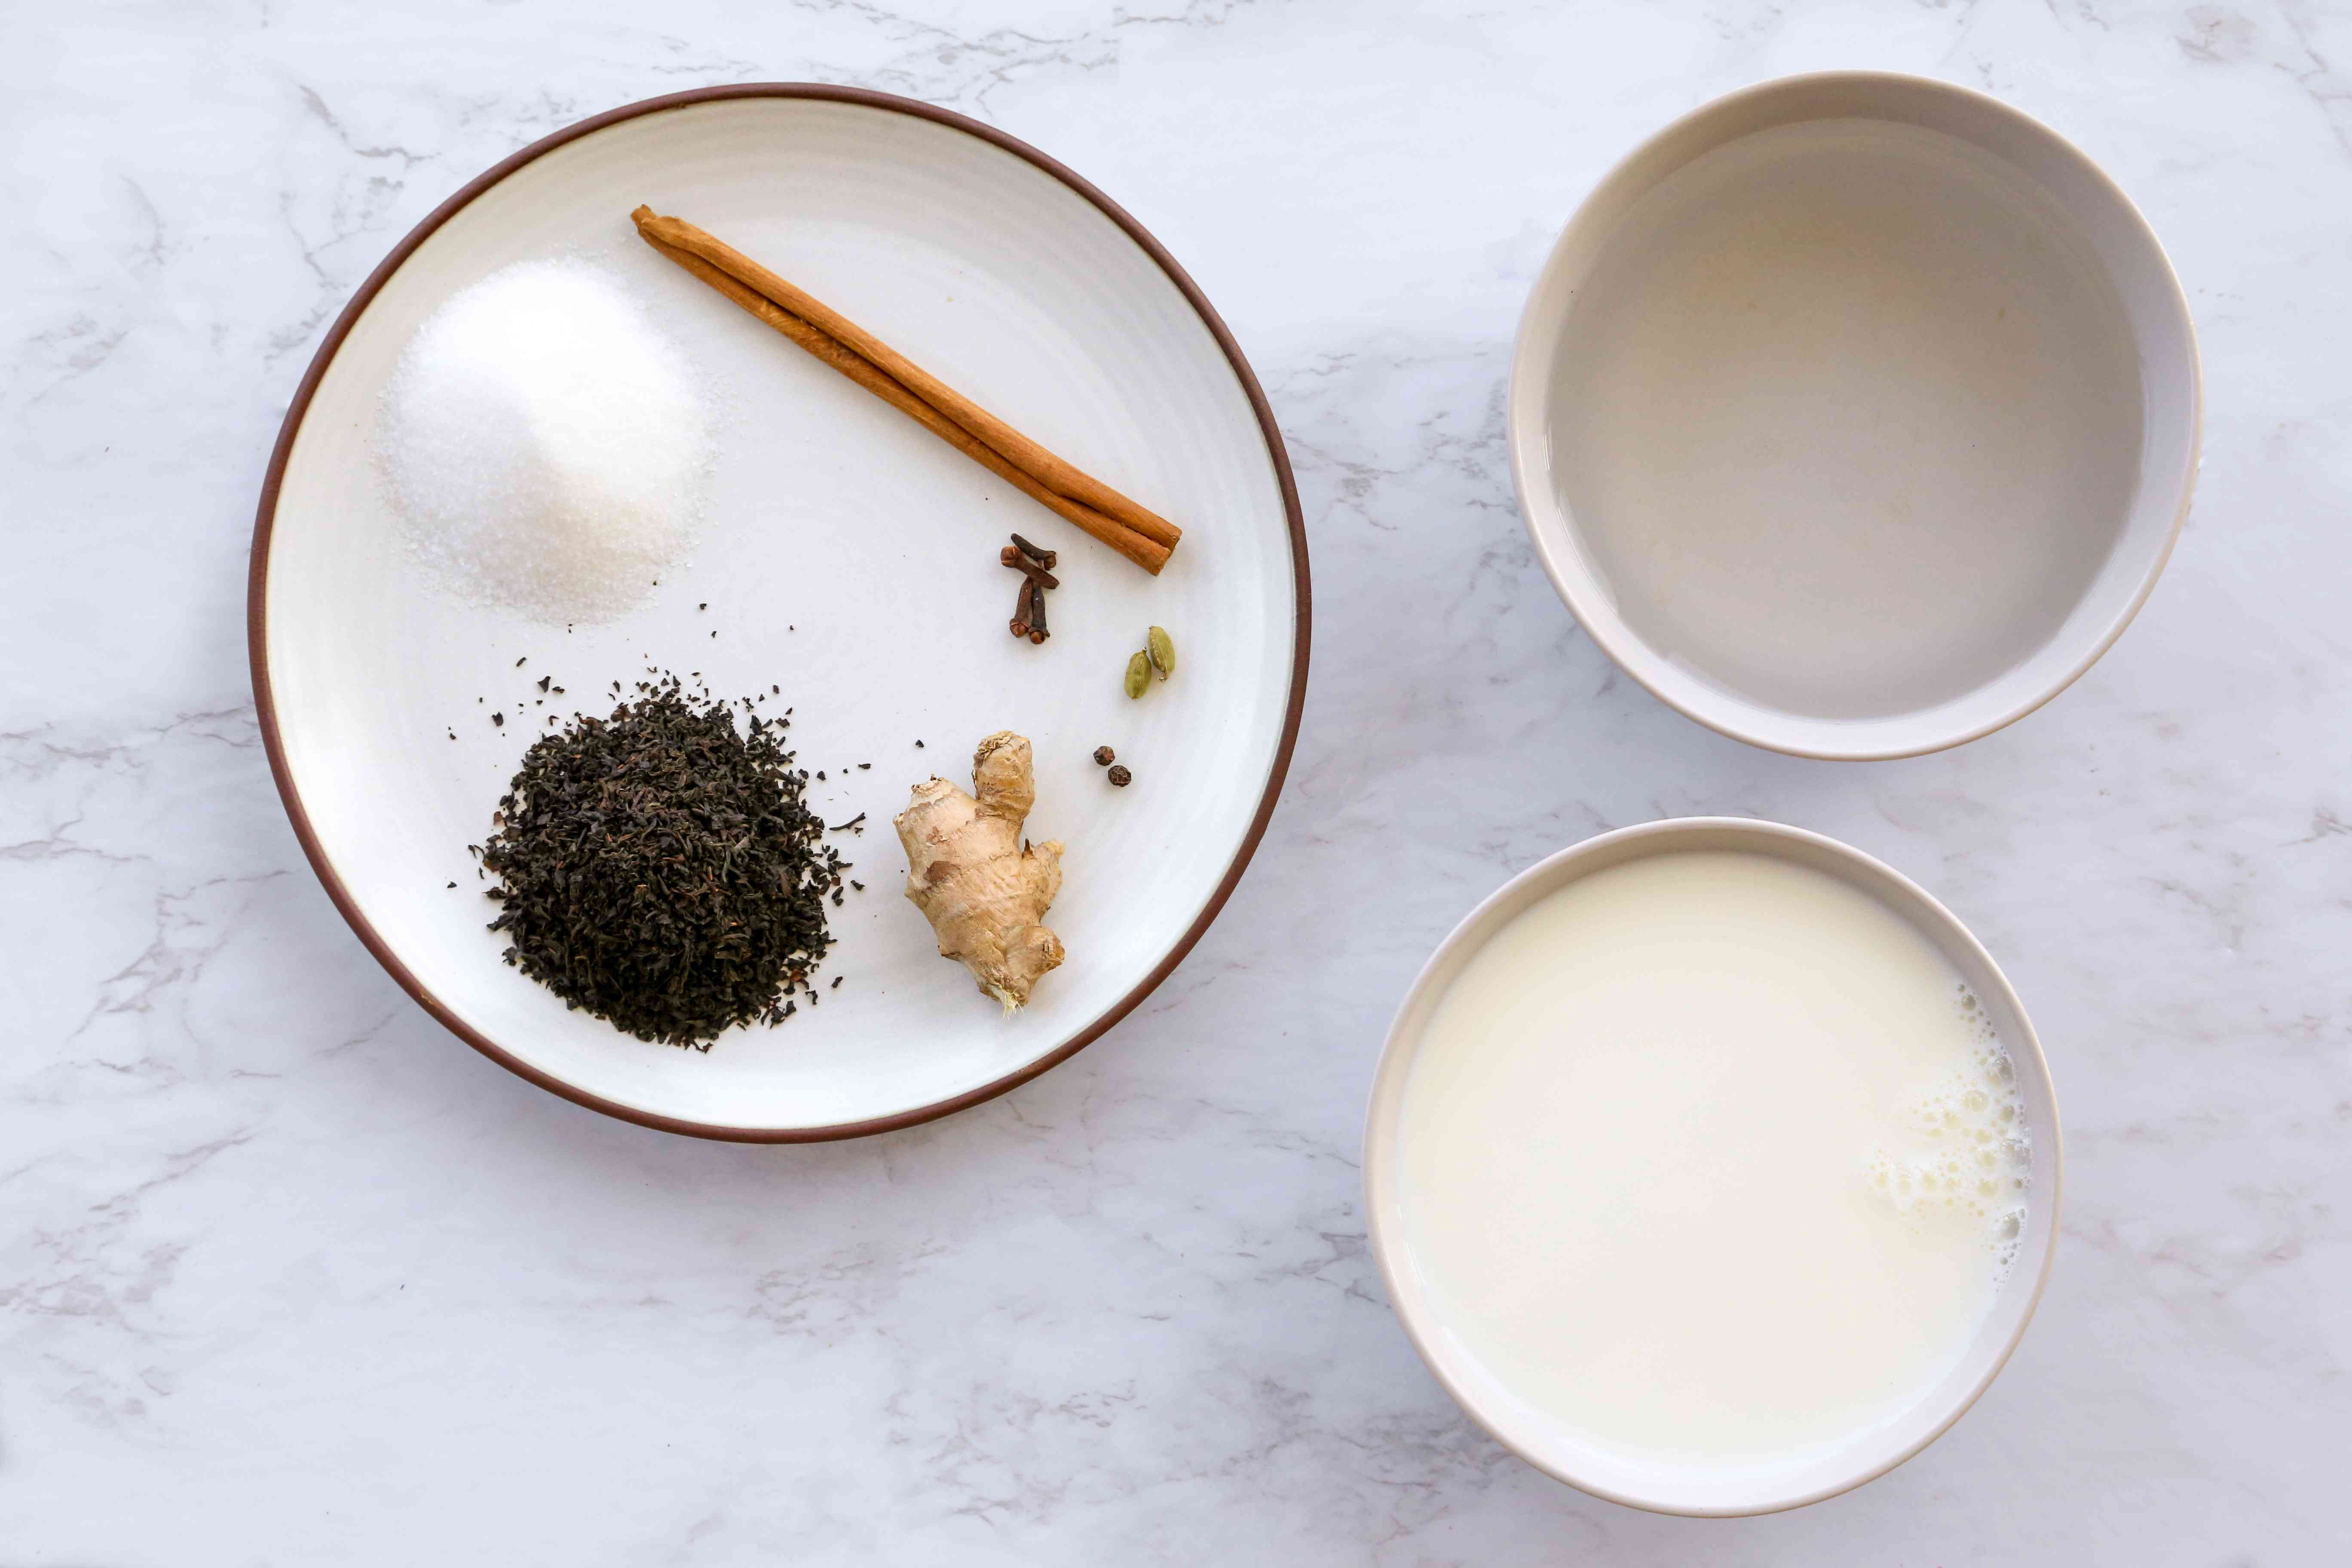 Homemade Masala Chai (Chai Tea) ingredients